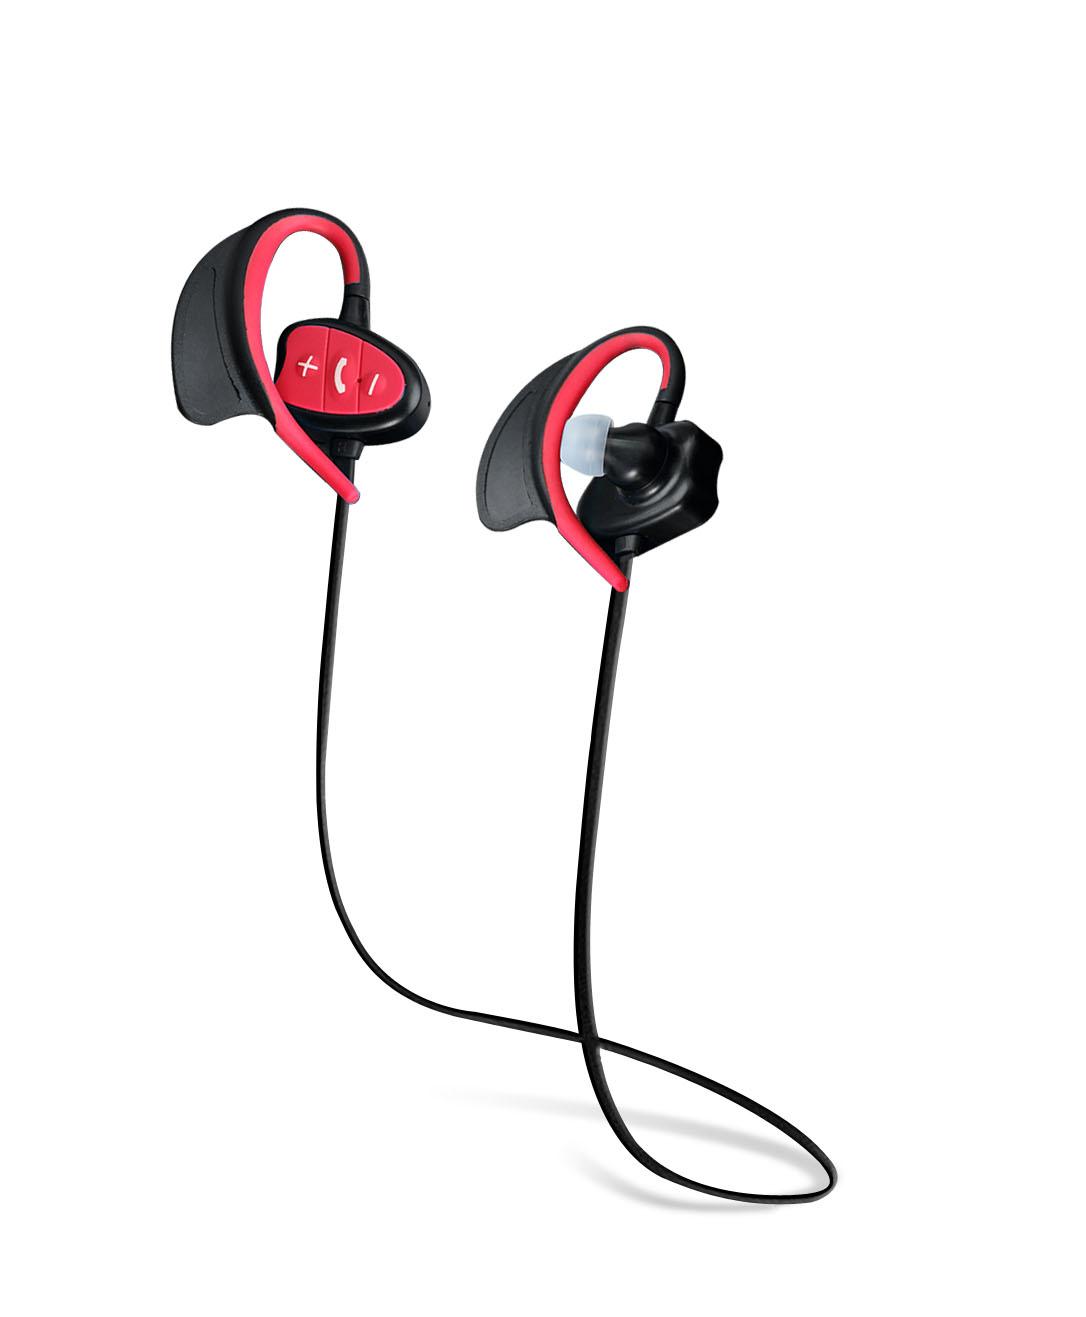 BH802 Sport waterproof wireless bluetooth headset